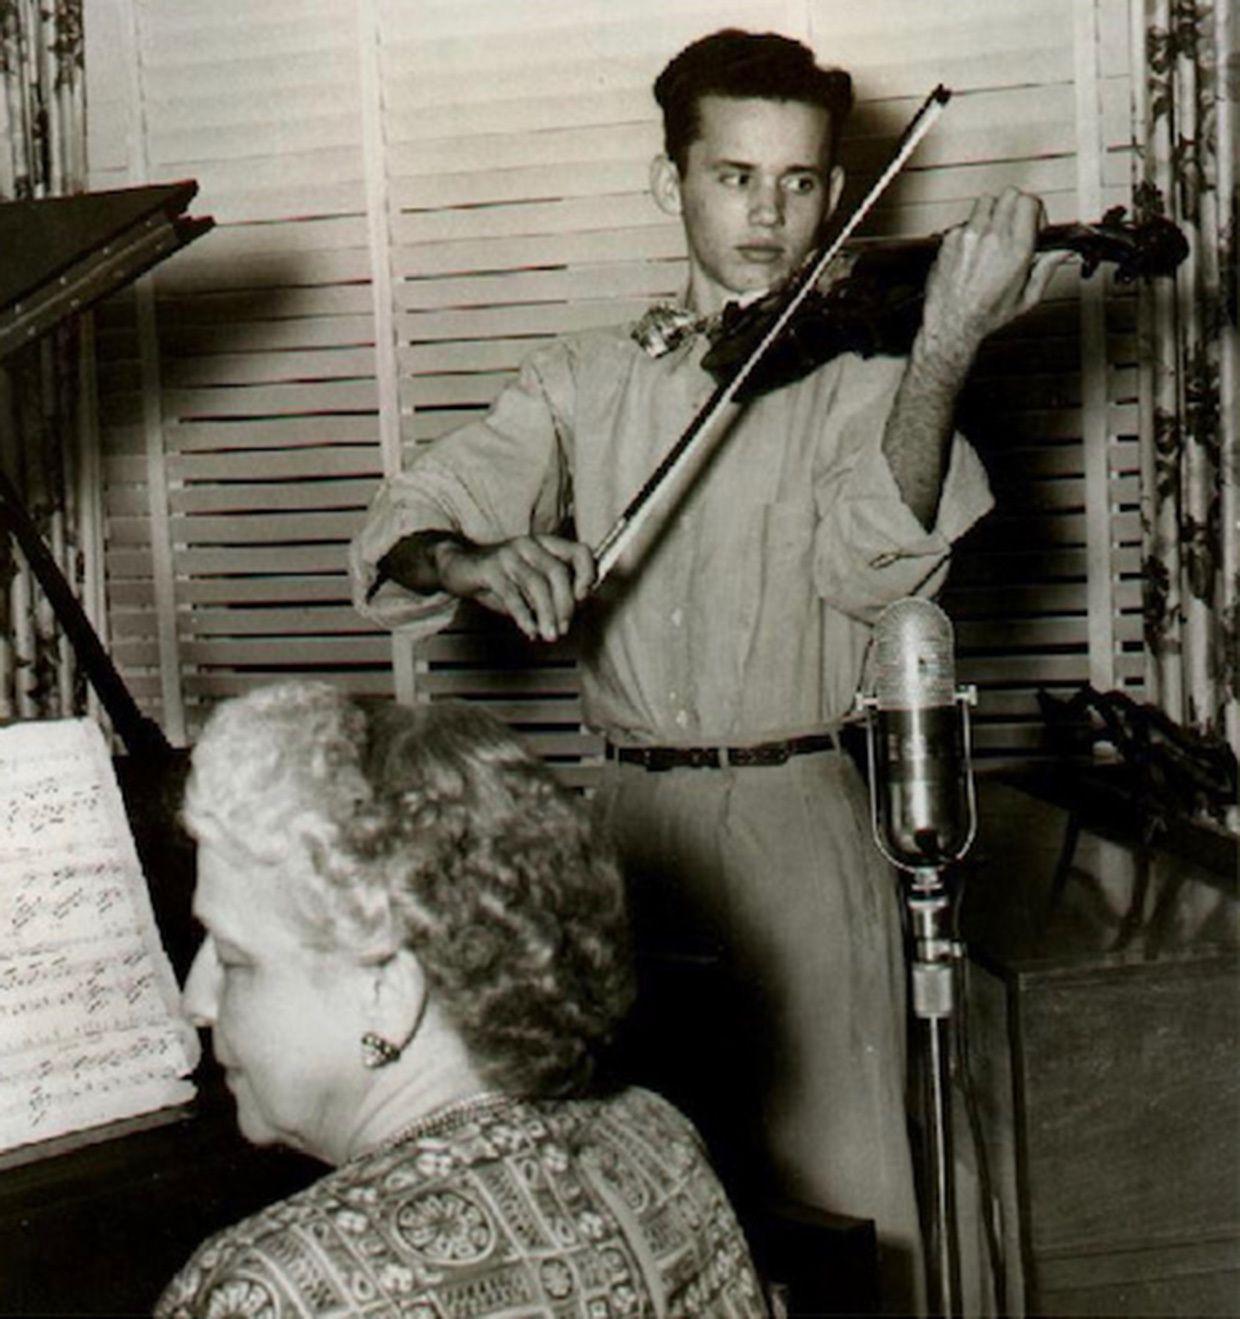 Eden performing a violin solo over a Miami radio station in 1947.